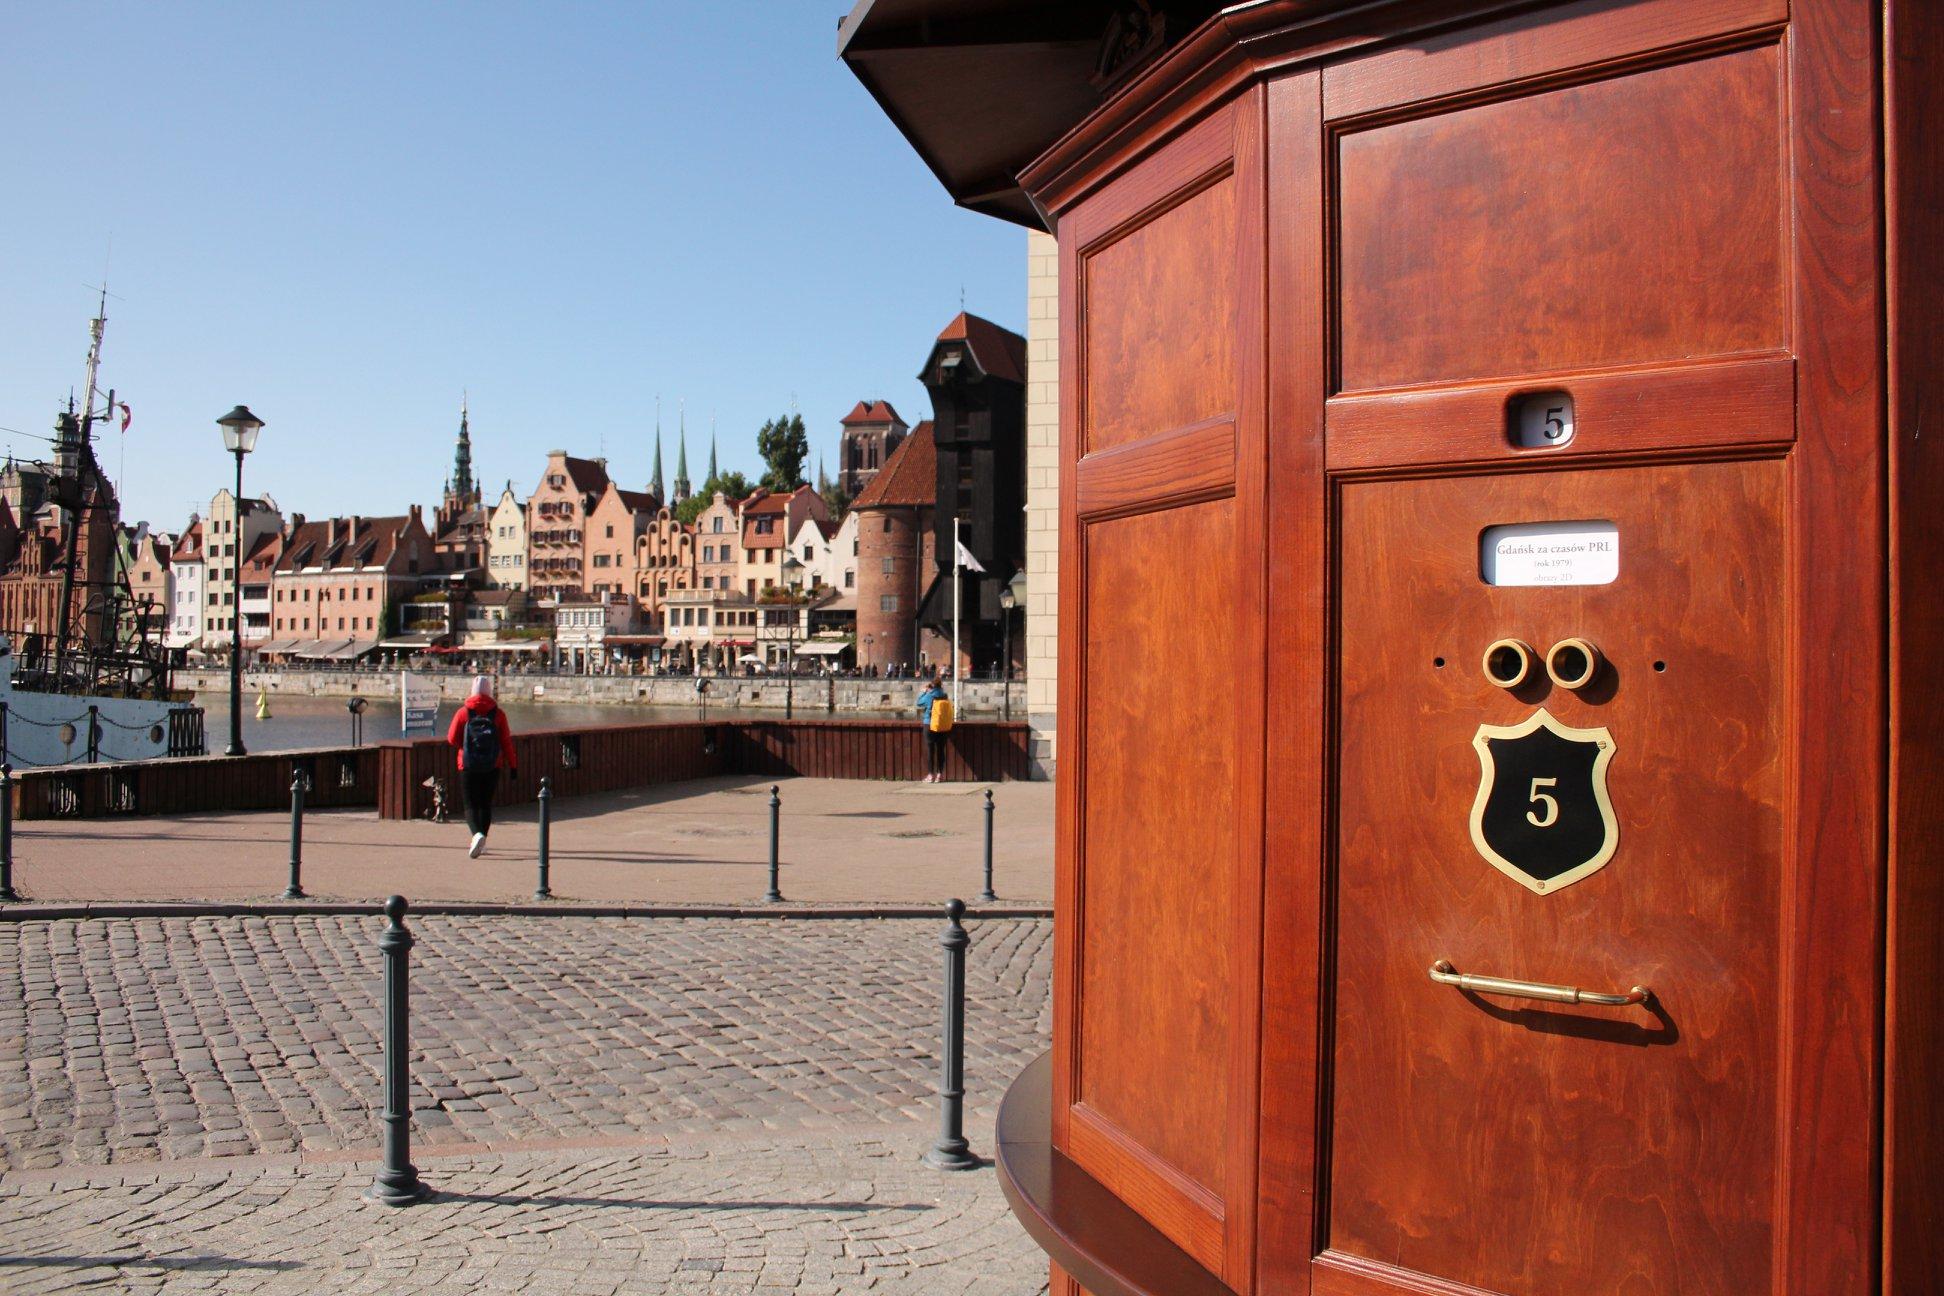 Street kaiserpanorama in Gdansk